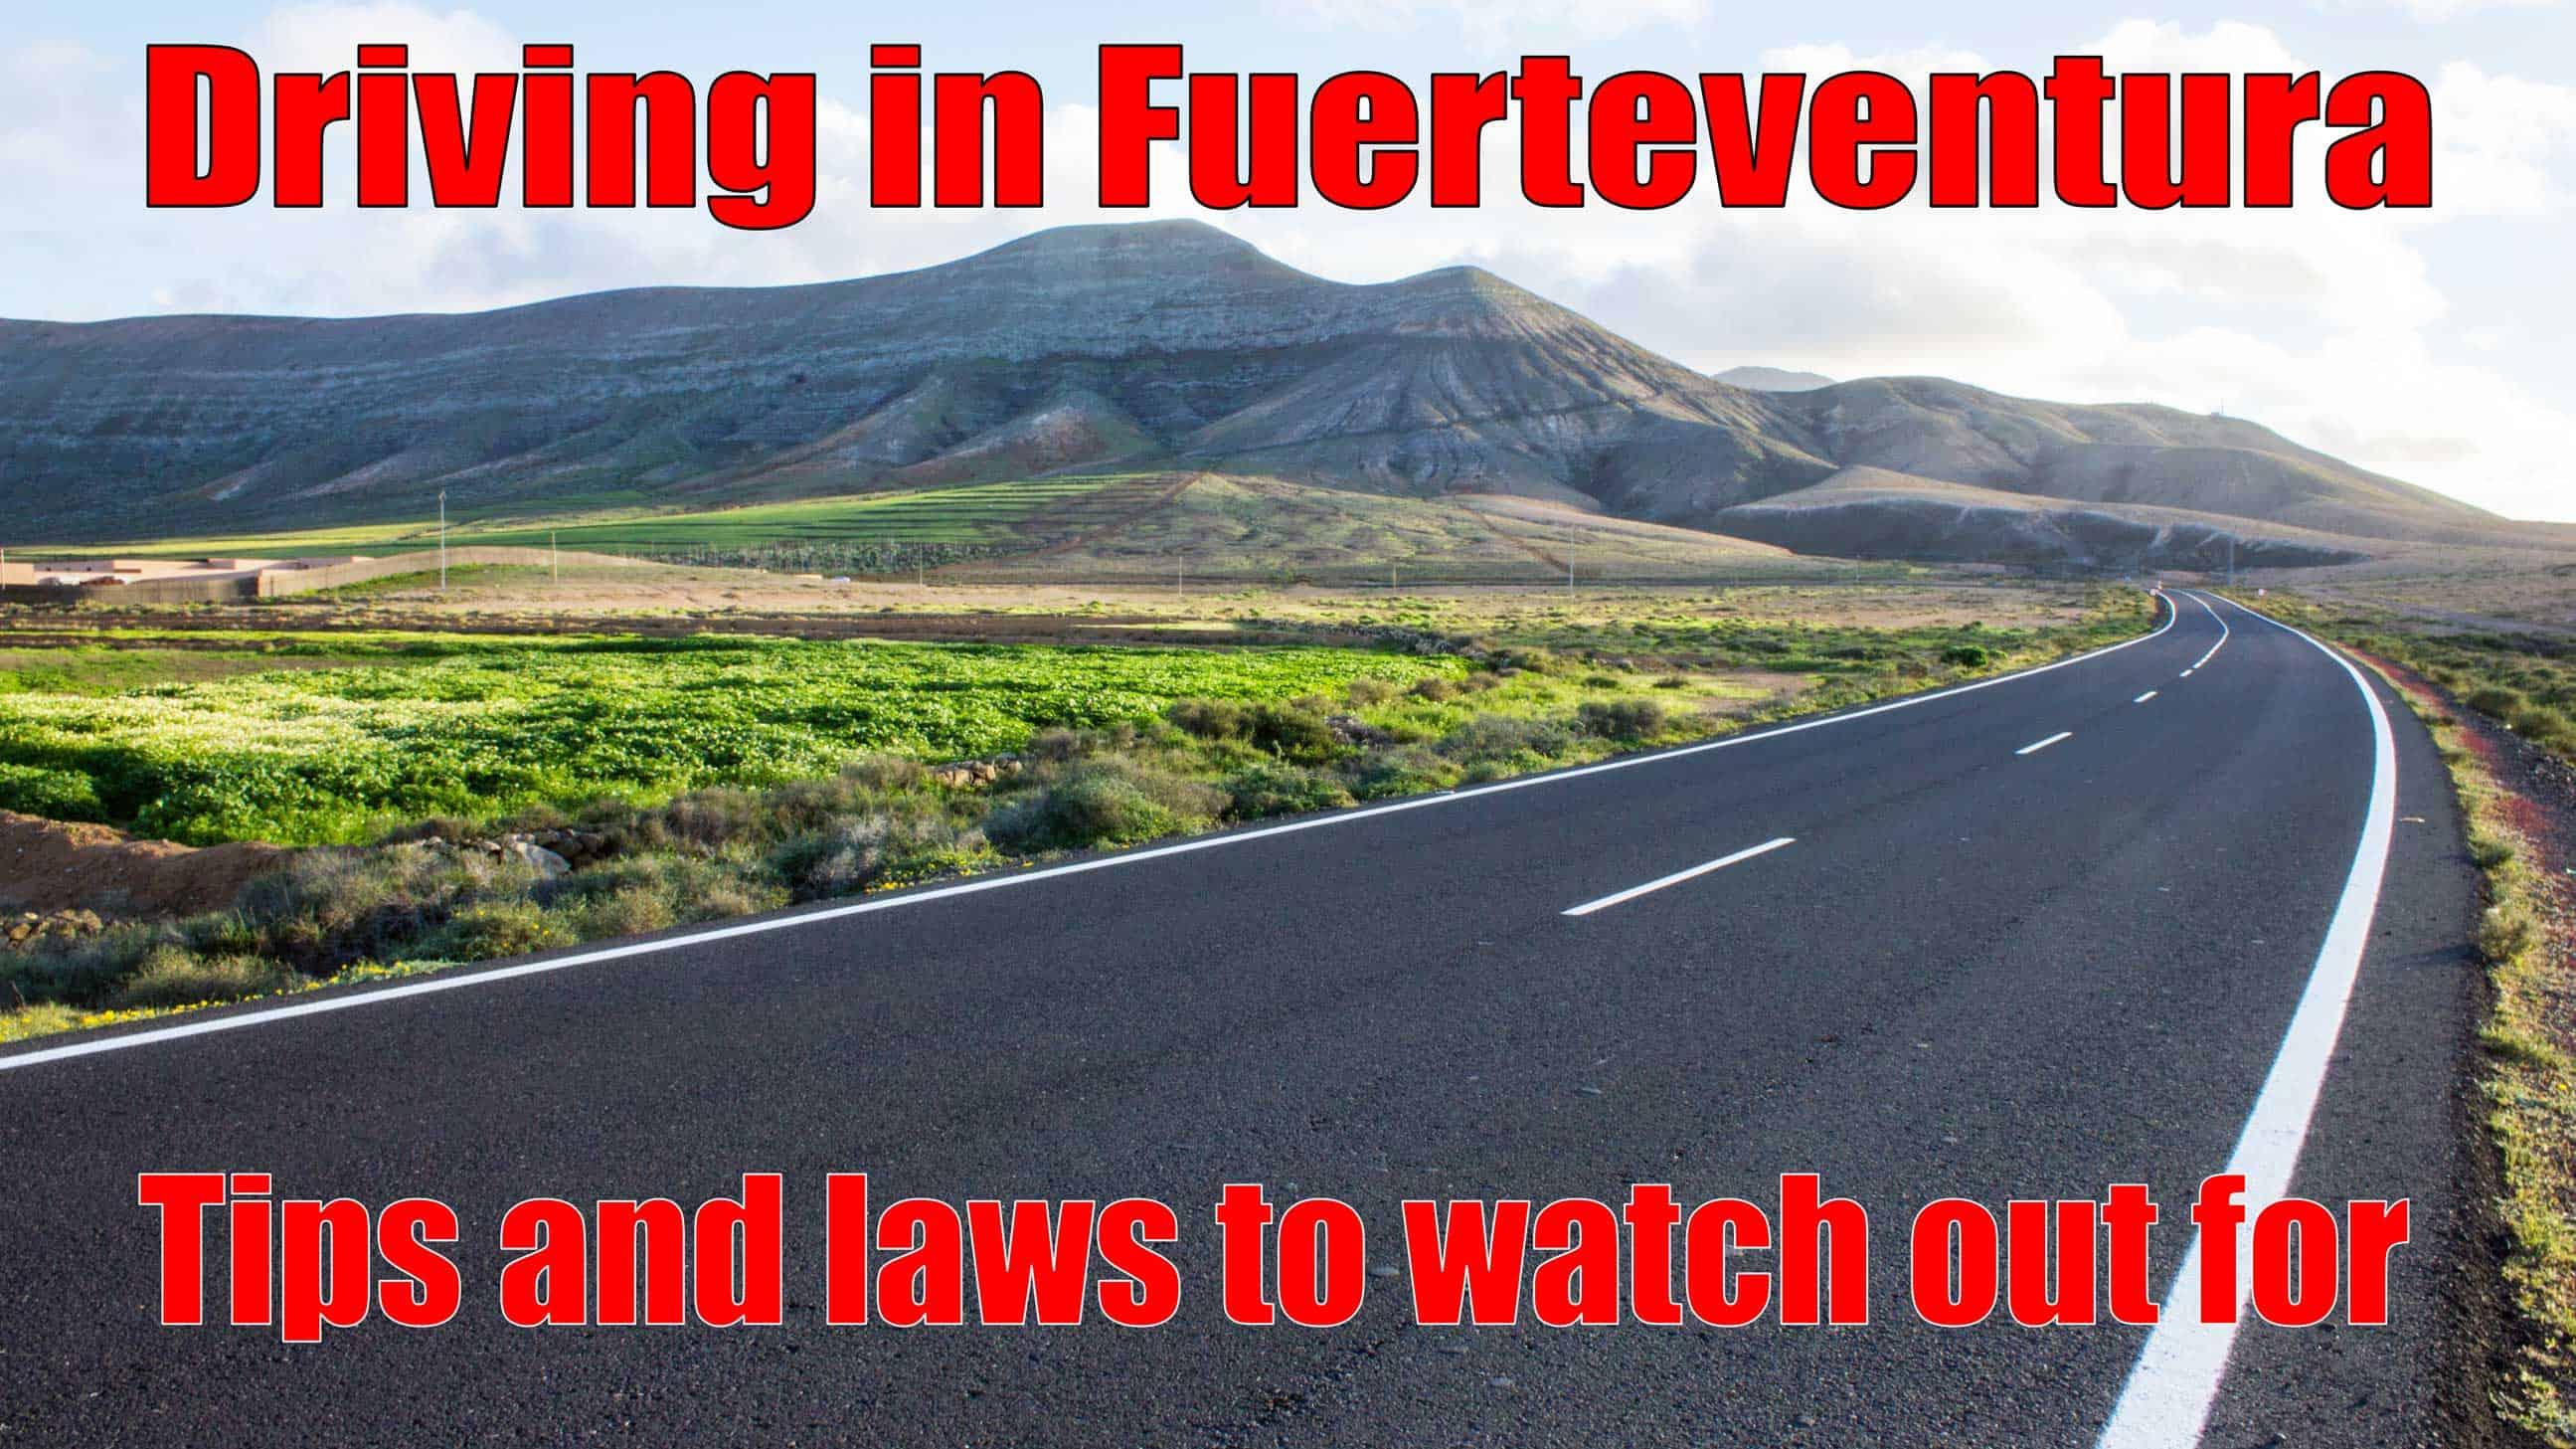 Tips for driving in fuerteventura